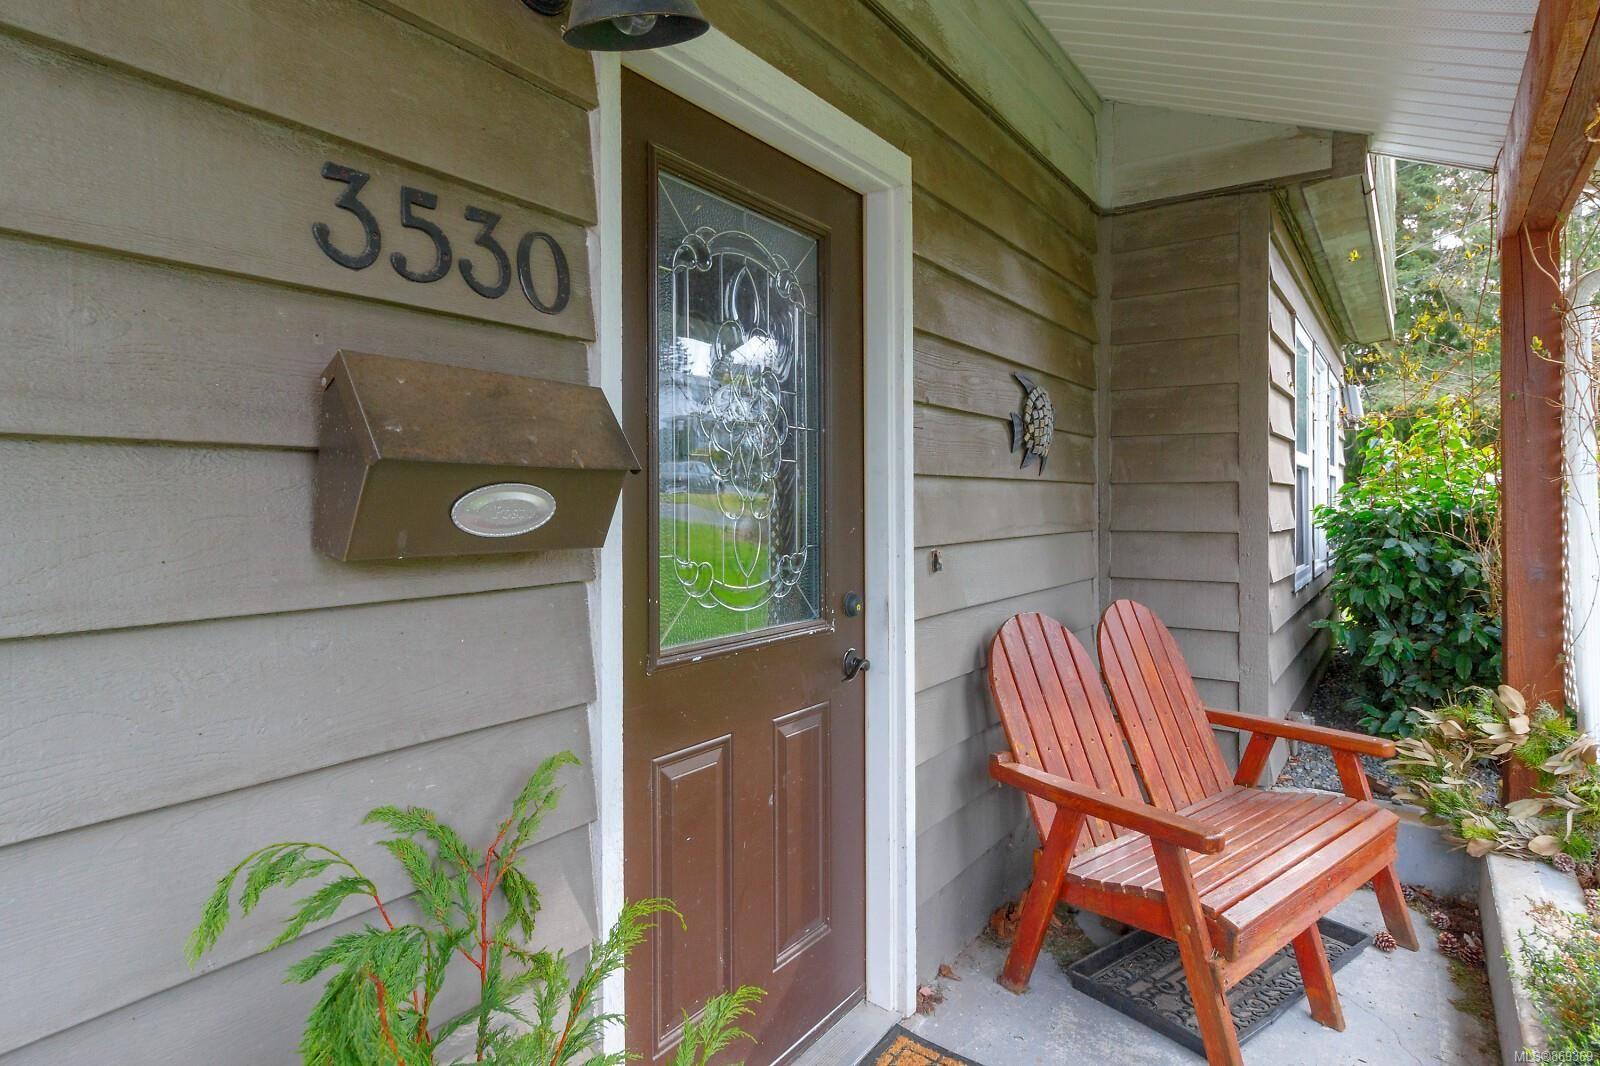 Main Photo: 3530 Falcon Dr in : Na Hammond Bay House for sale (Nanaimo)  : MLS®# 869369